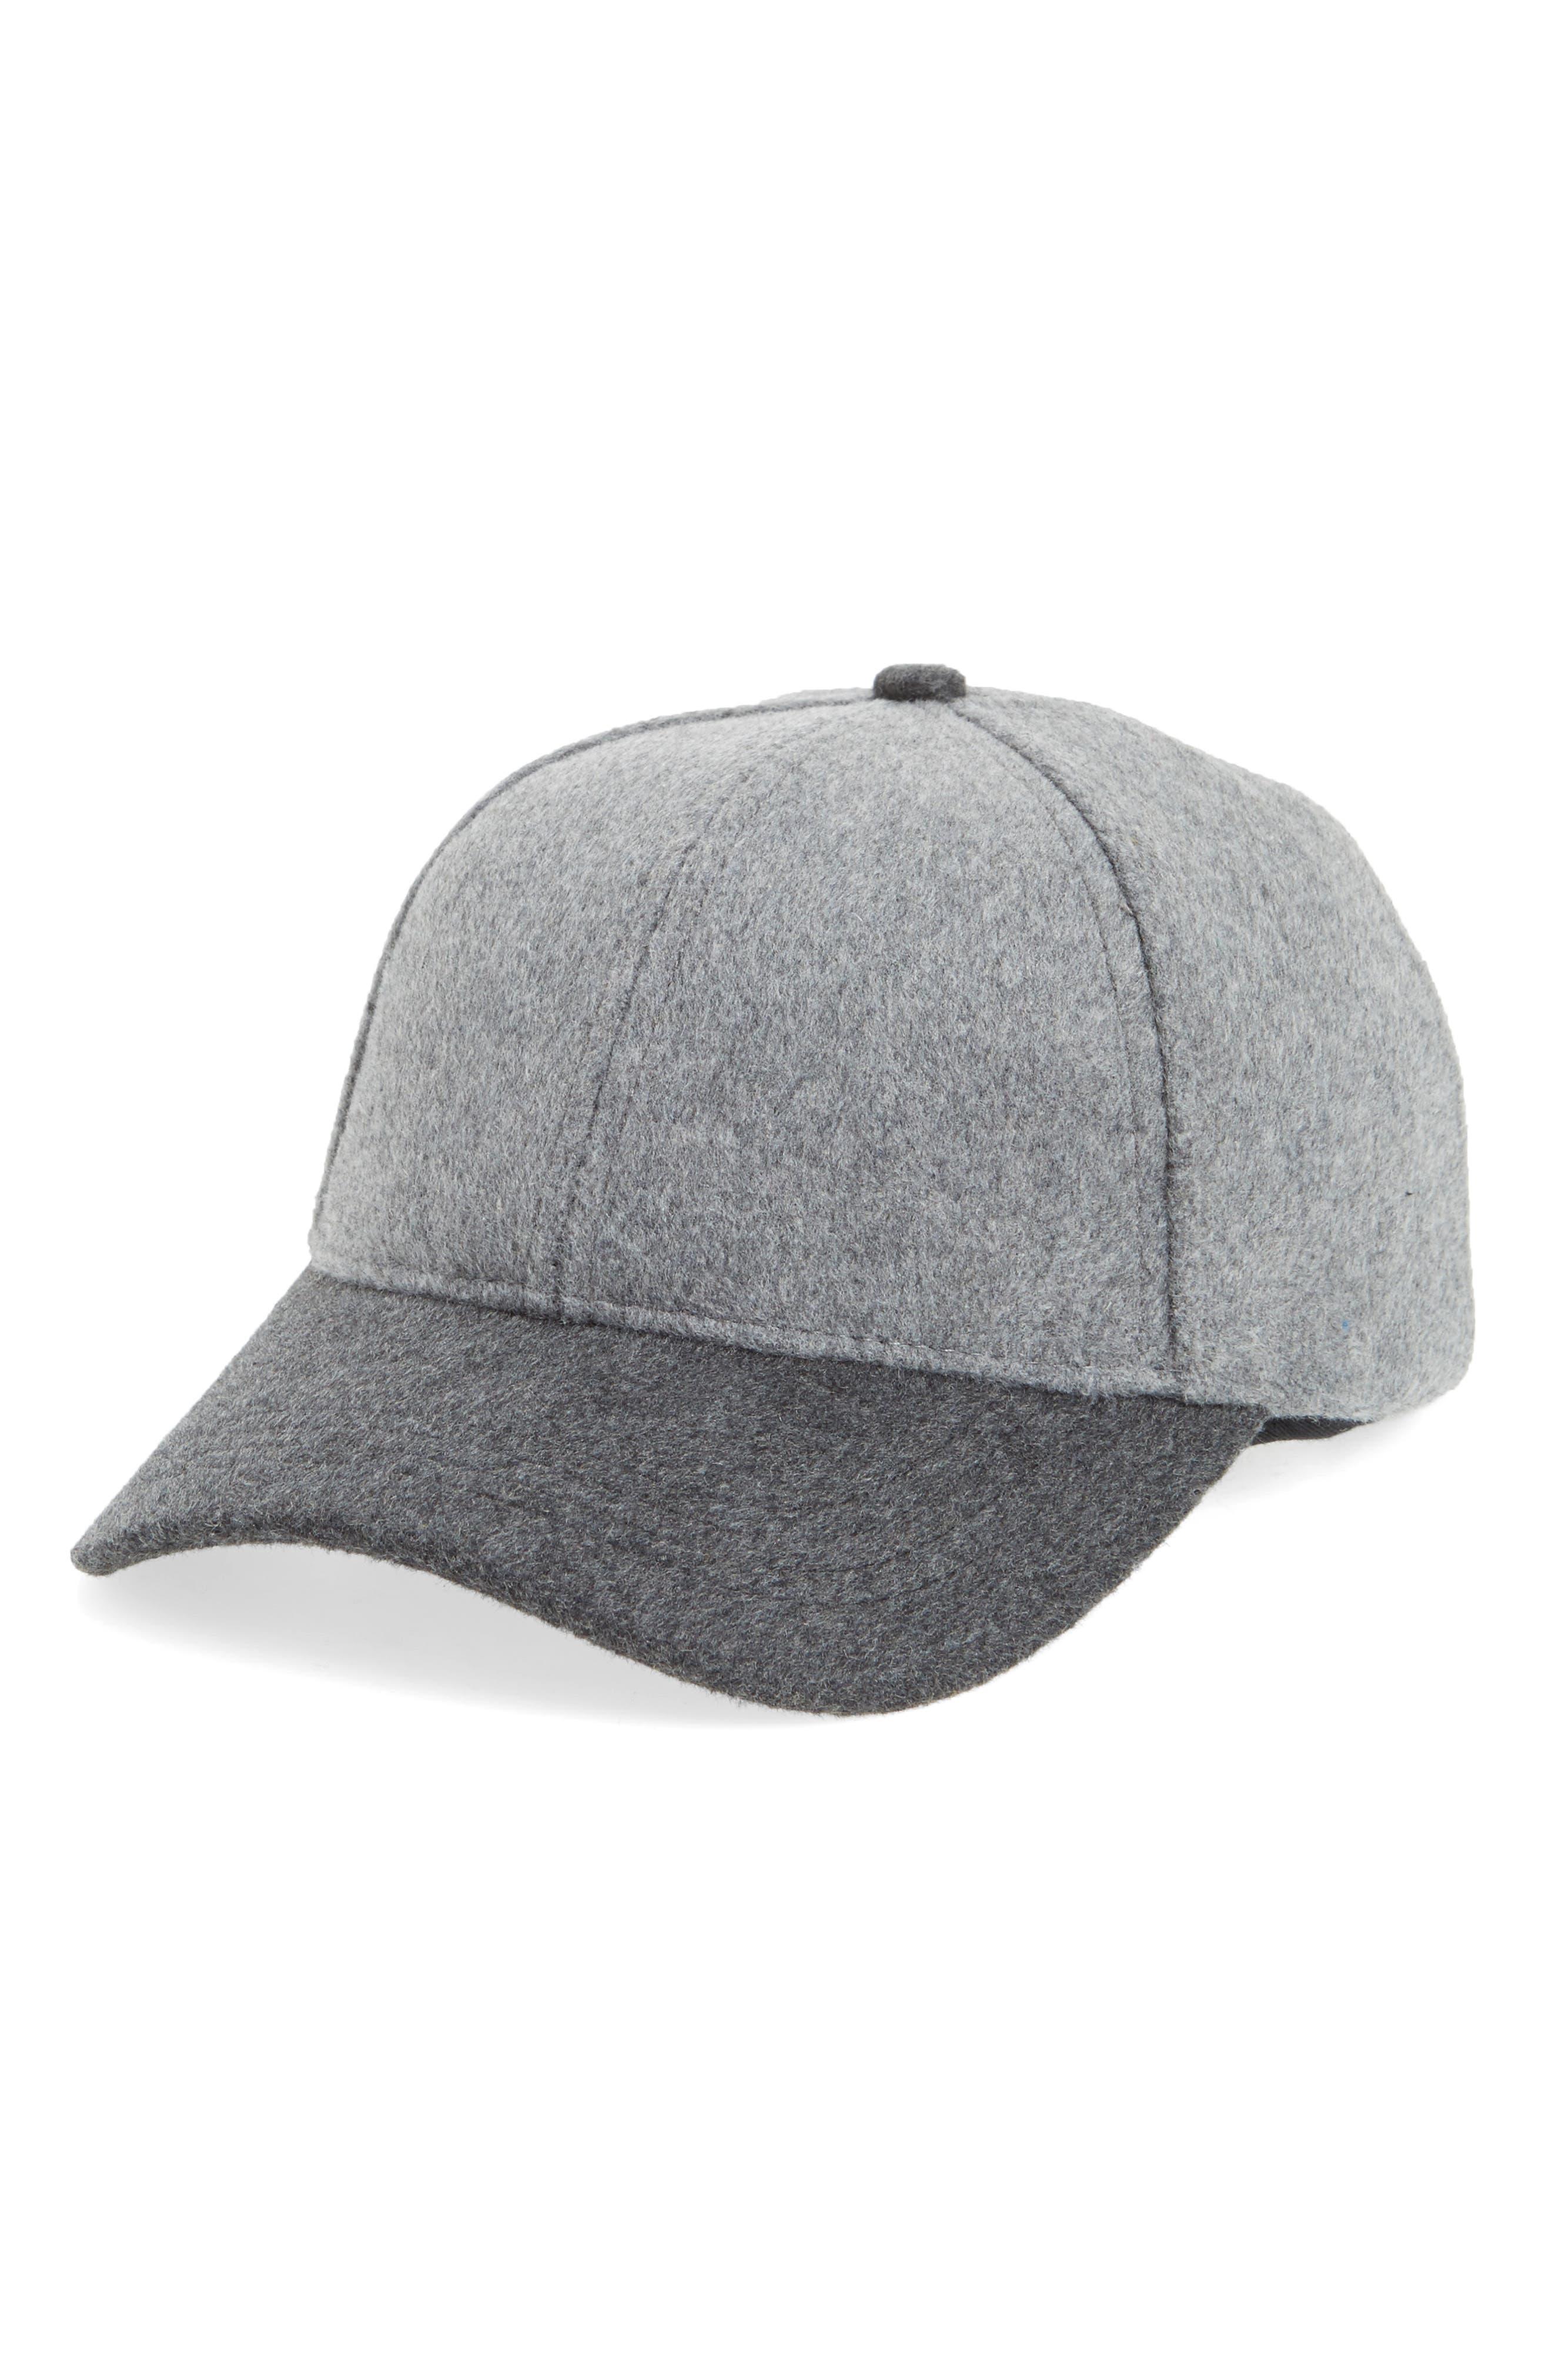 Two-Tone Baseball Cap,                             Main thumbnail 1, color,                             020